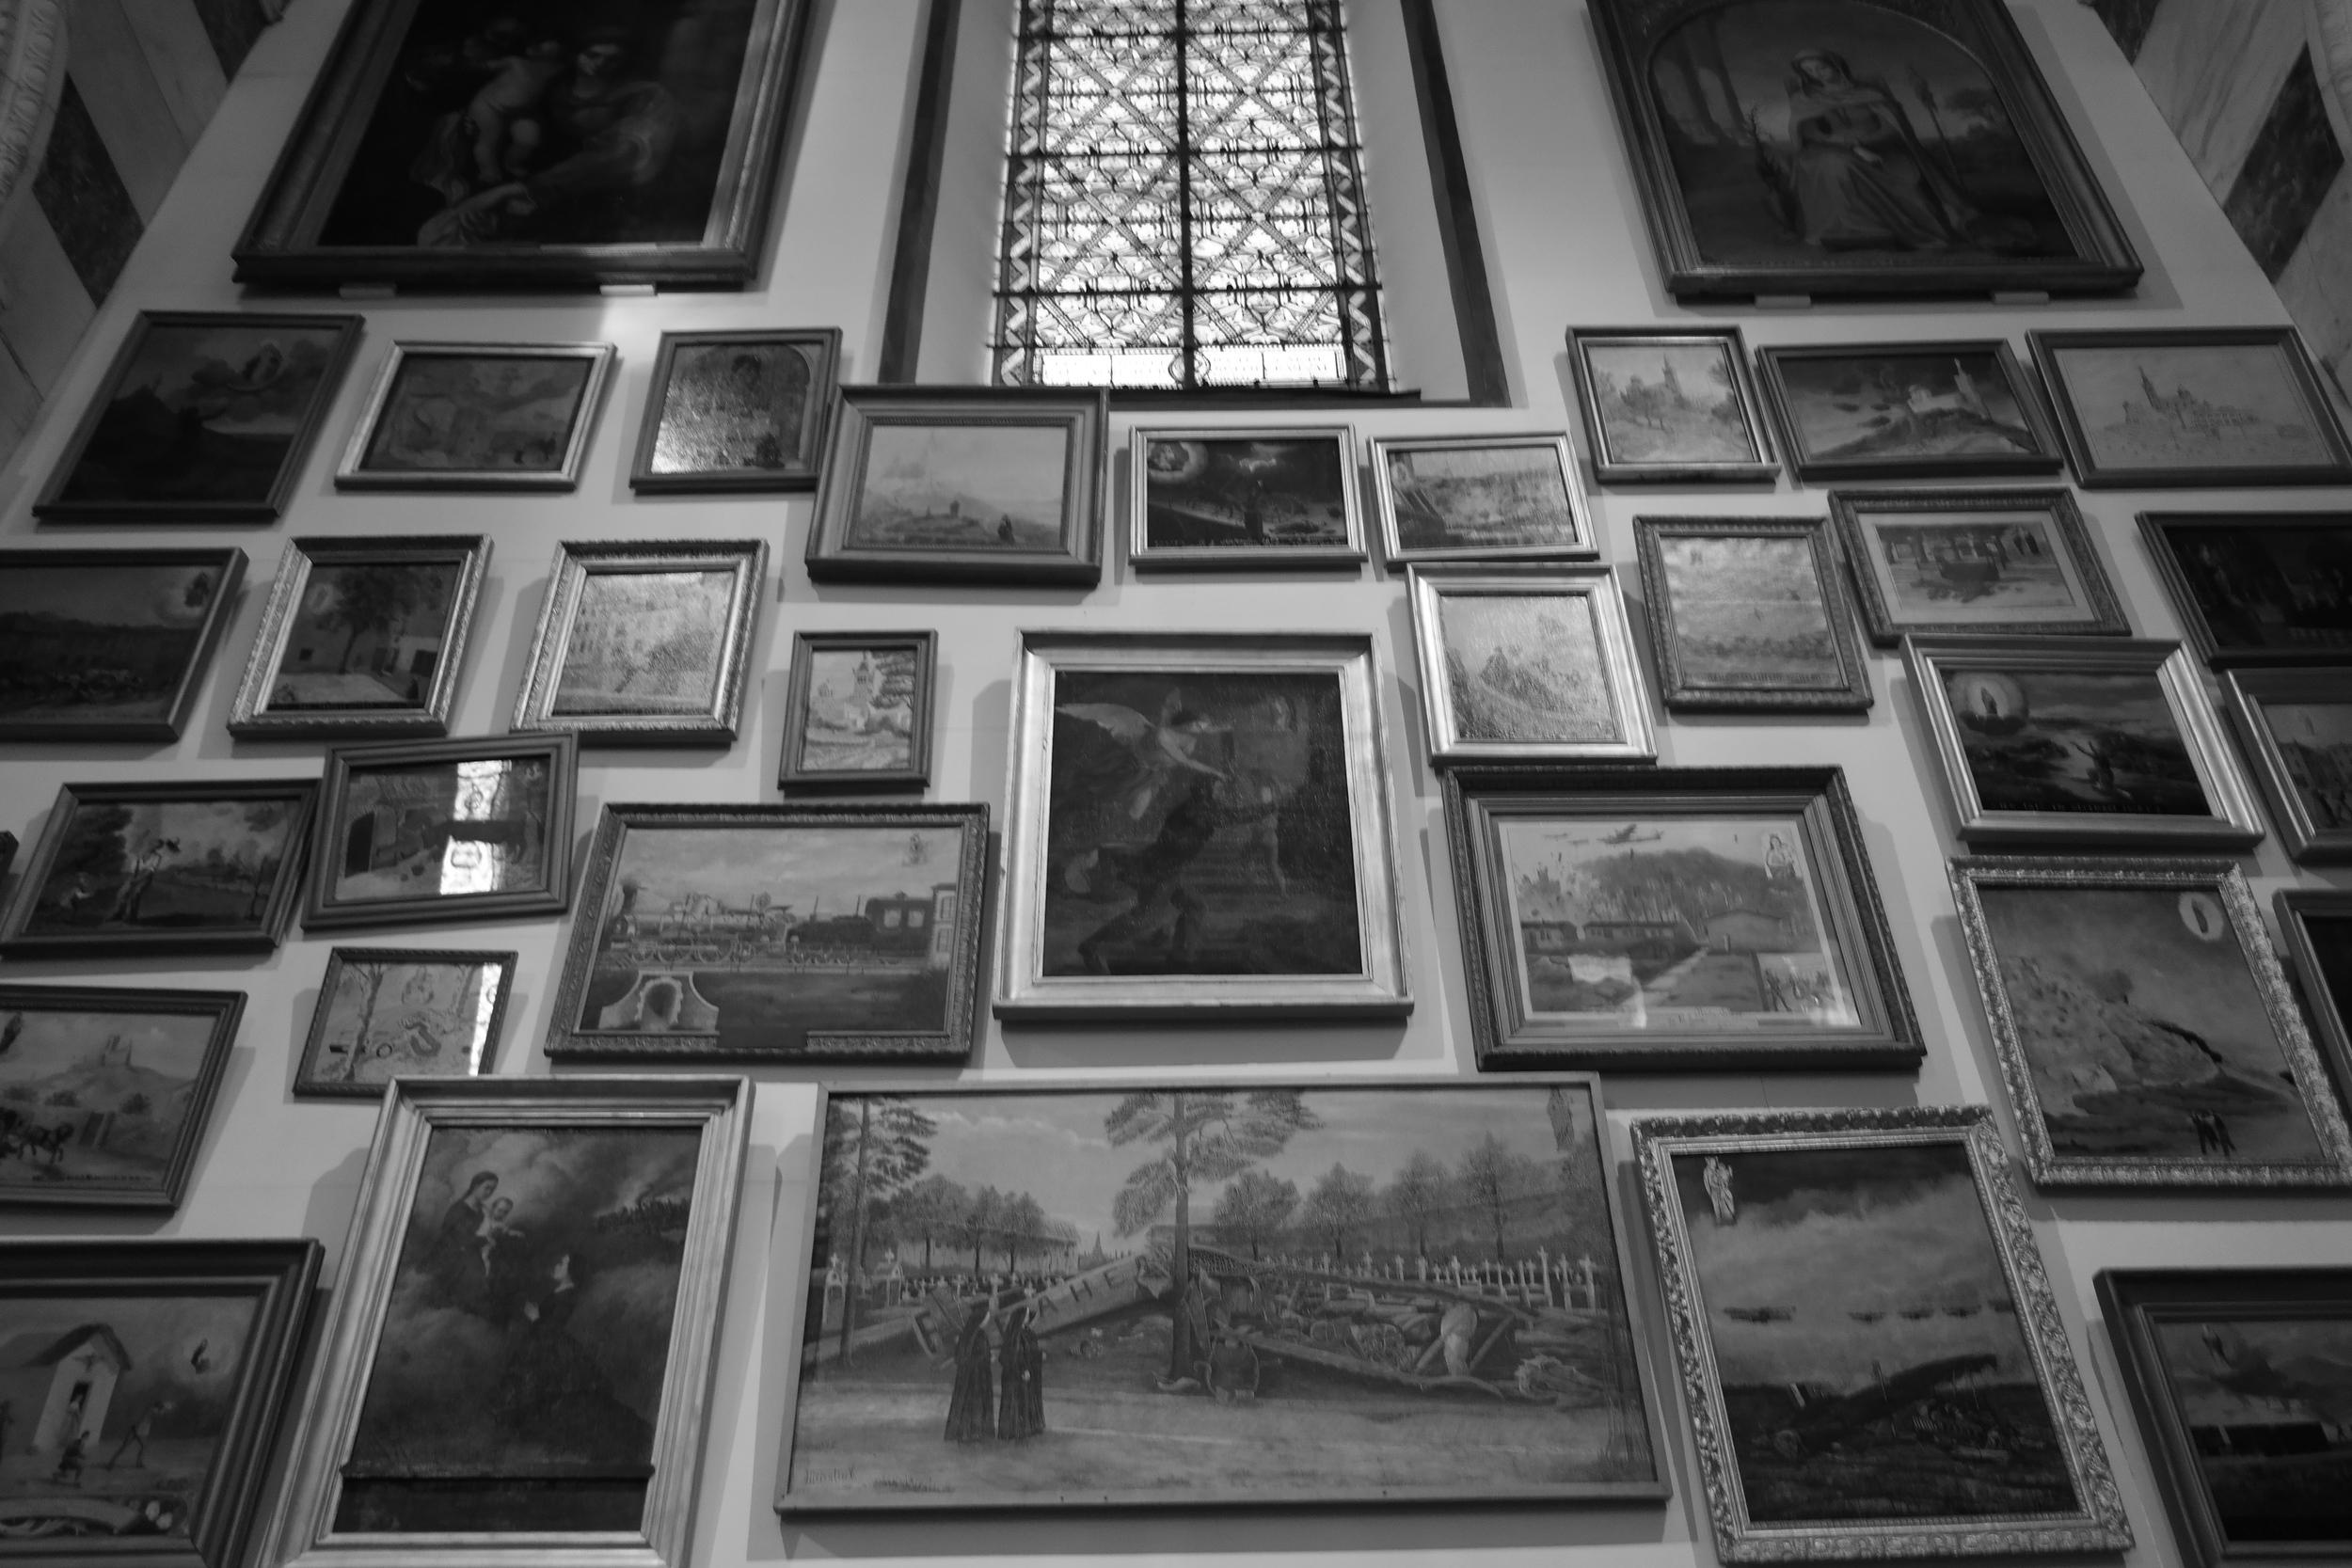 Decoration inside Notre Dame de la Garde. Strange for a church, isn't it?